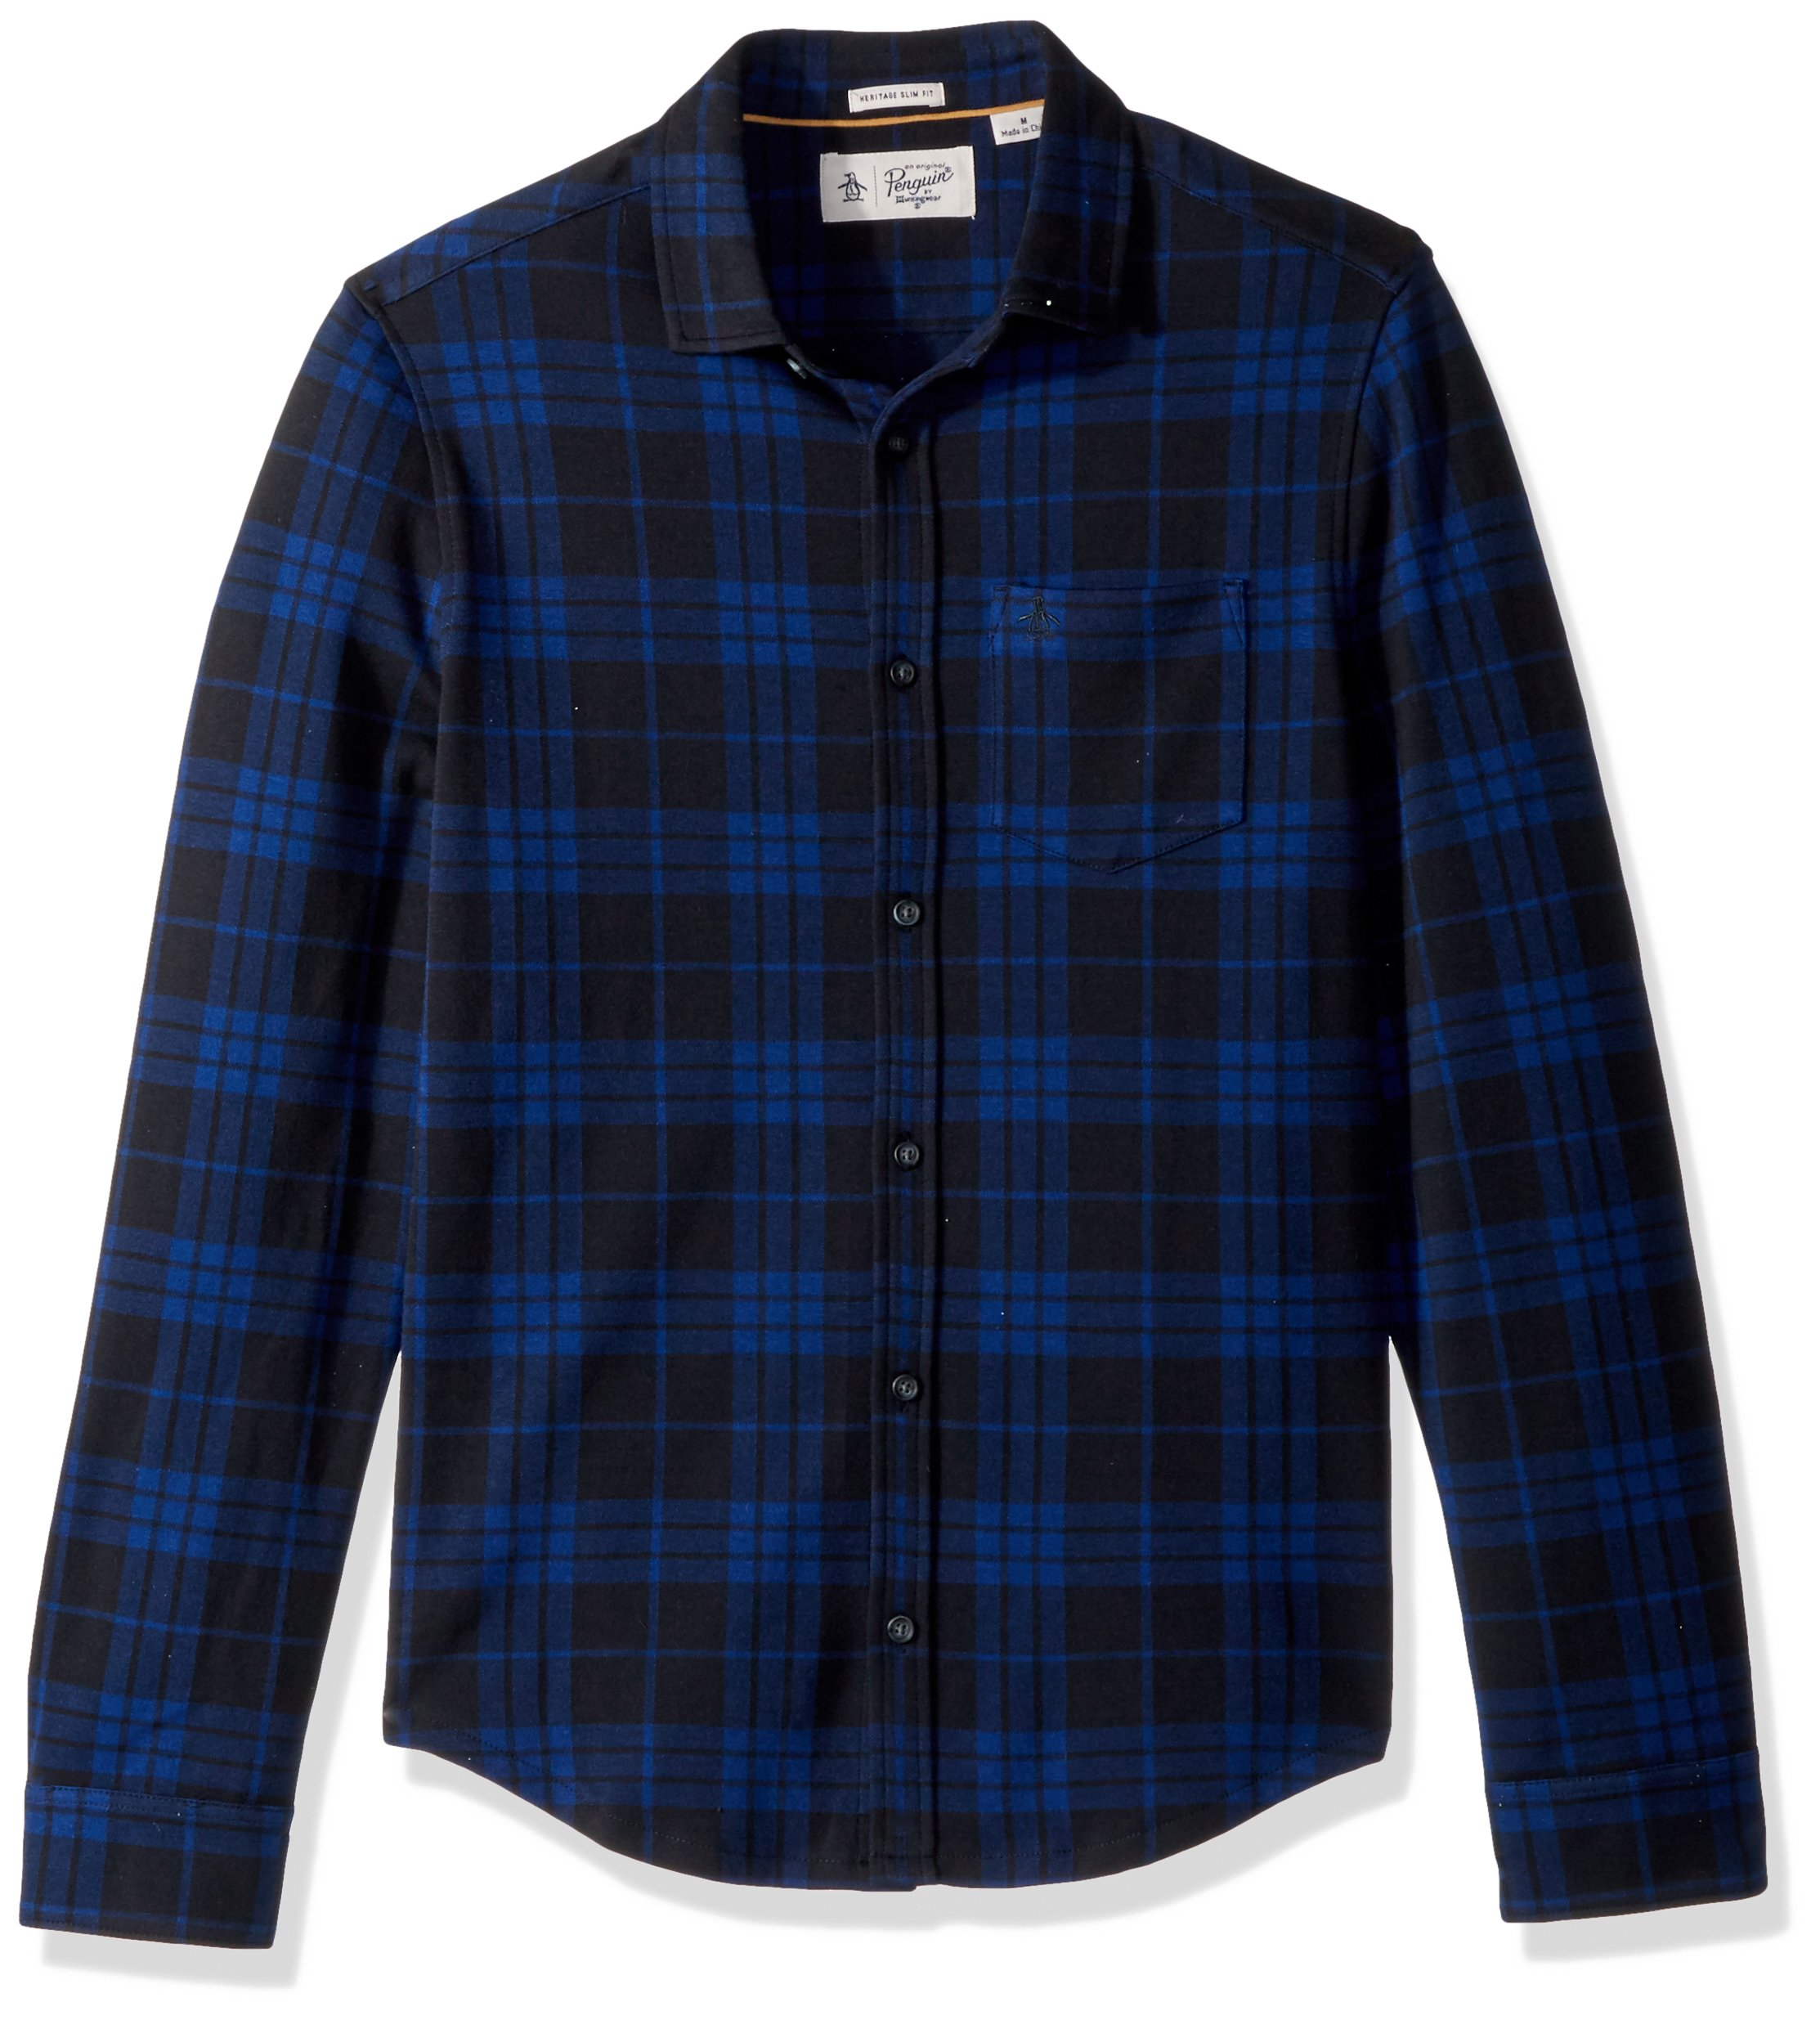 Original Penguin Men's Long Sleeve Knitted Plaid Shirt, Blue Depths, Extra Large